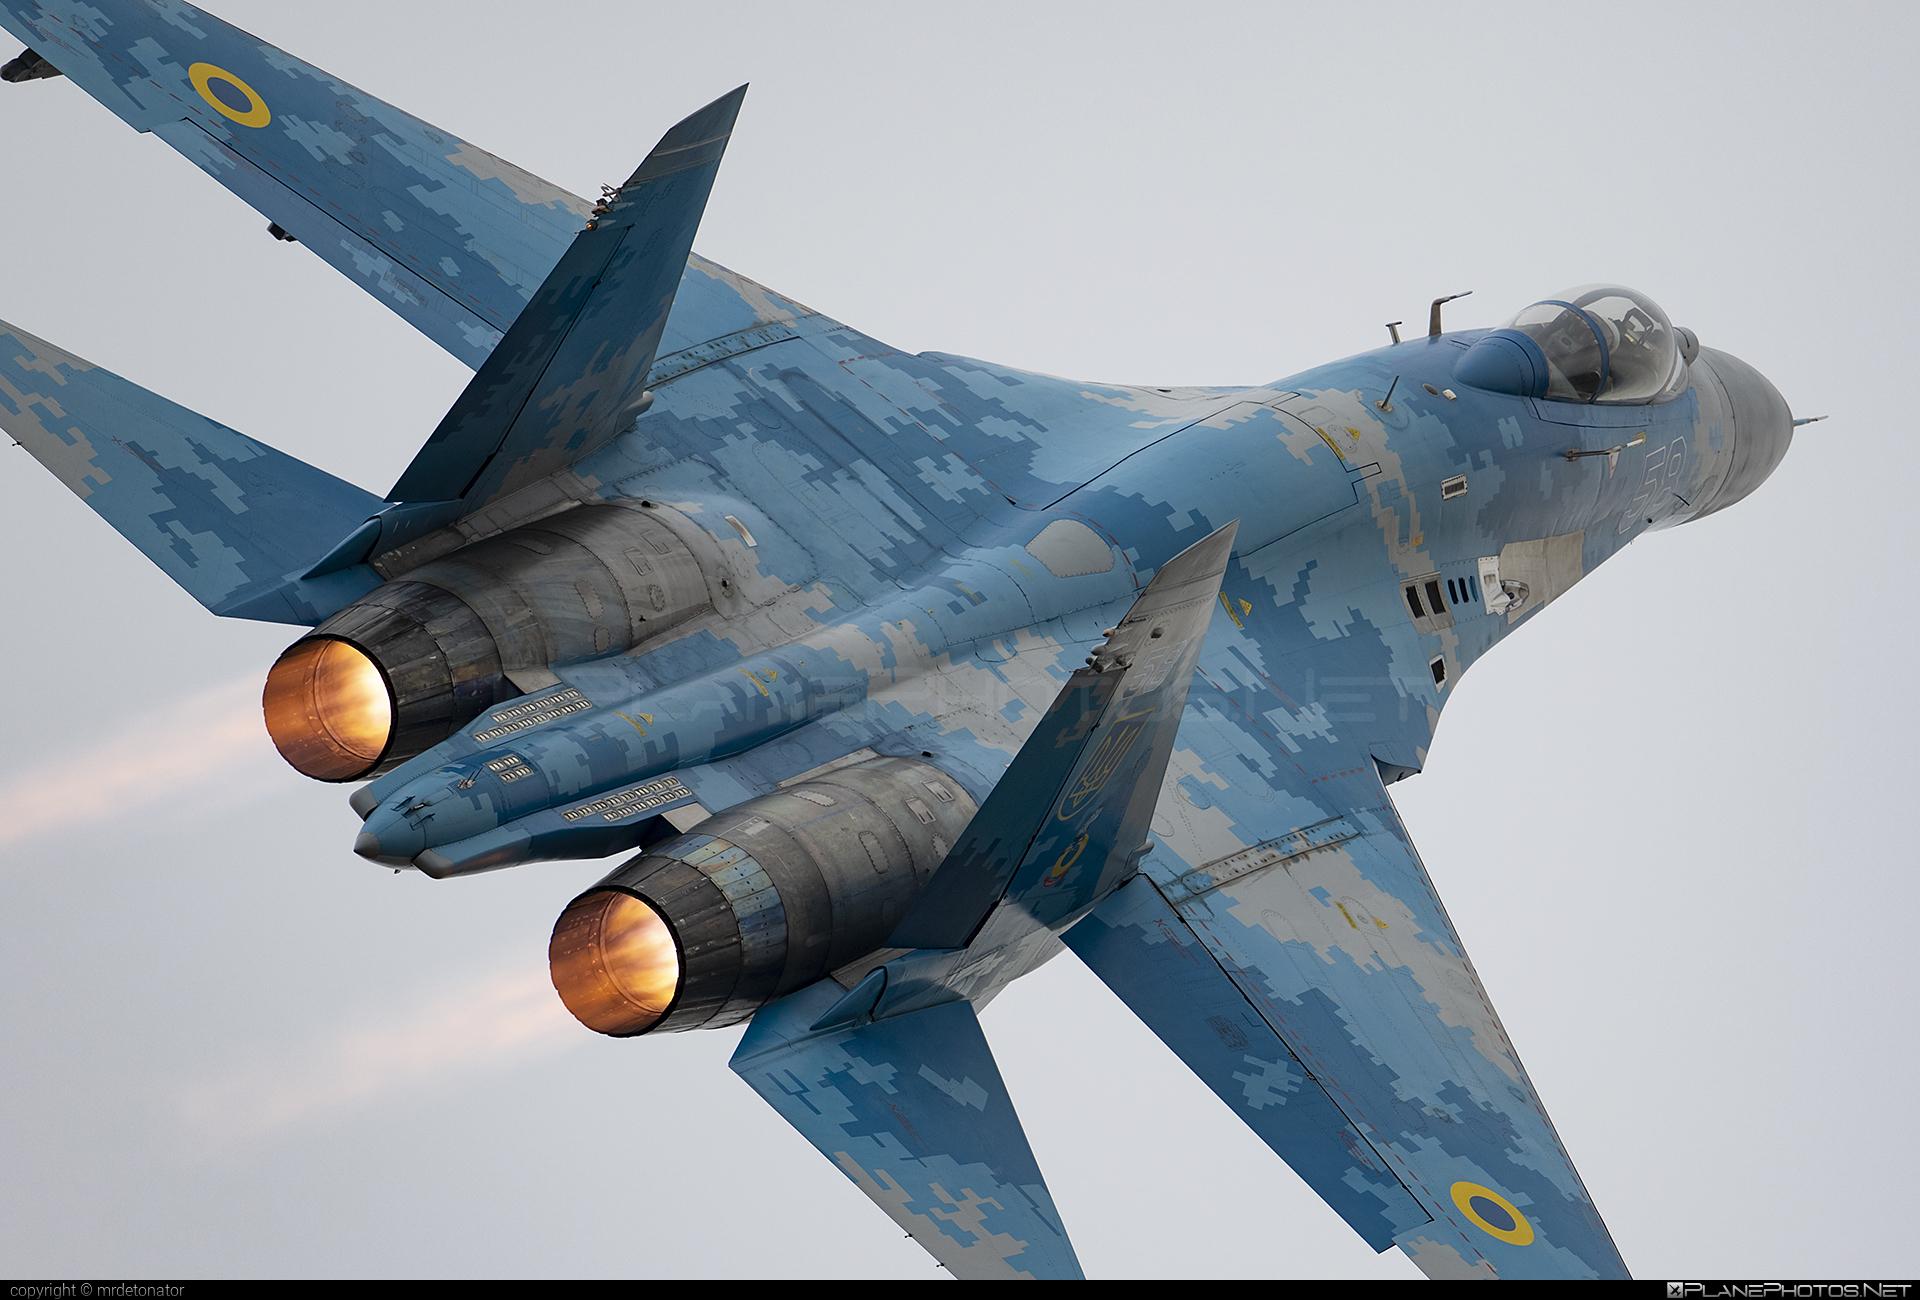 Sukhoi Su-27P - 58 operated by Povitryani Syly Ukrayiny (Ukrainian Air Force) #povitryanisylyukrayiny #radomairshow2018 #su27 #su27p #sukhoi #sukhoi27 #ukrainianairforce